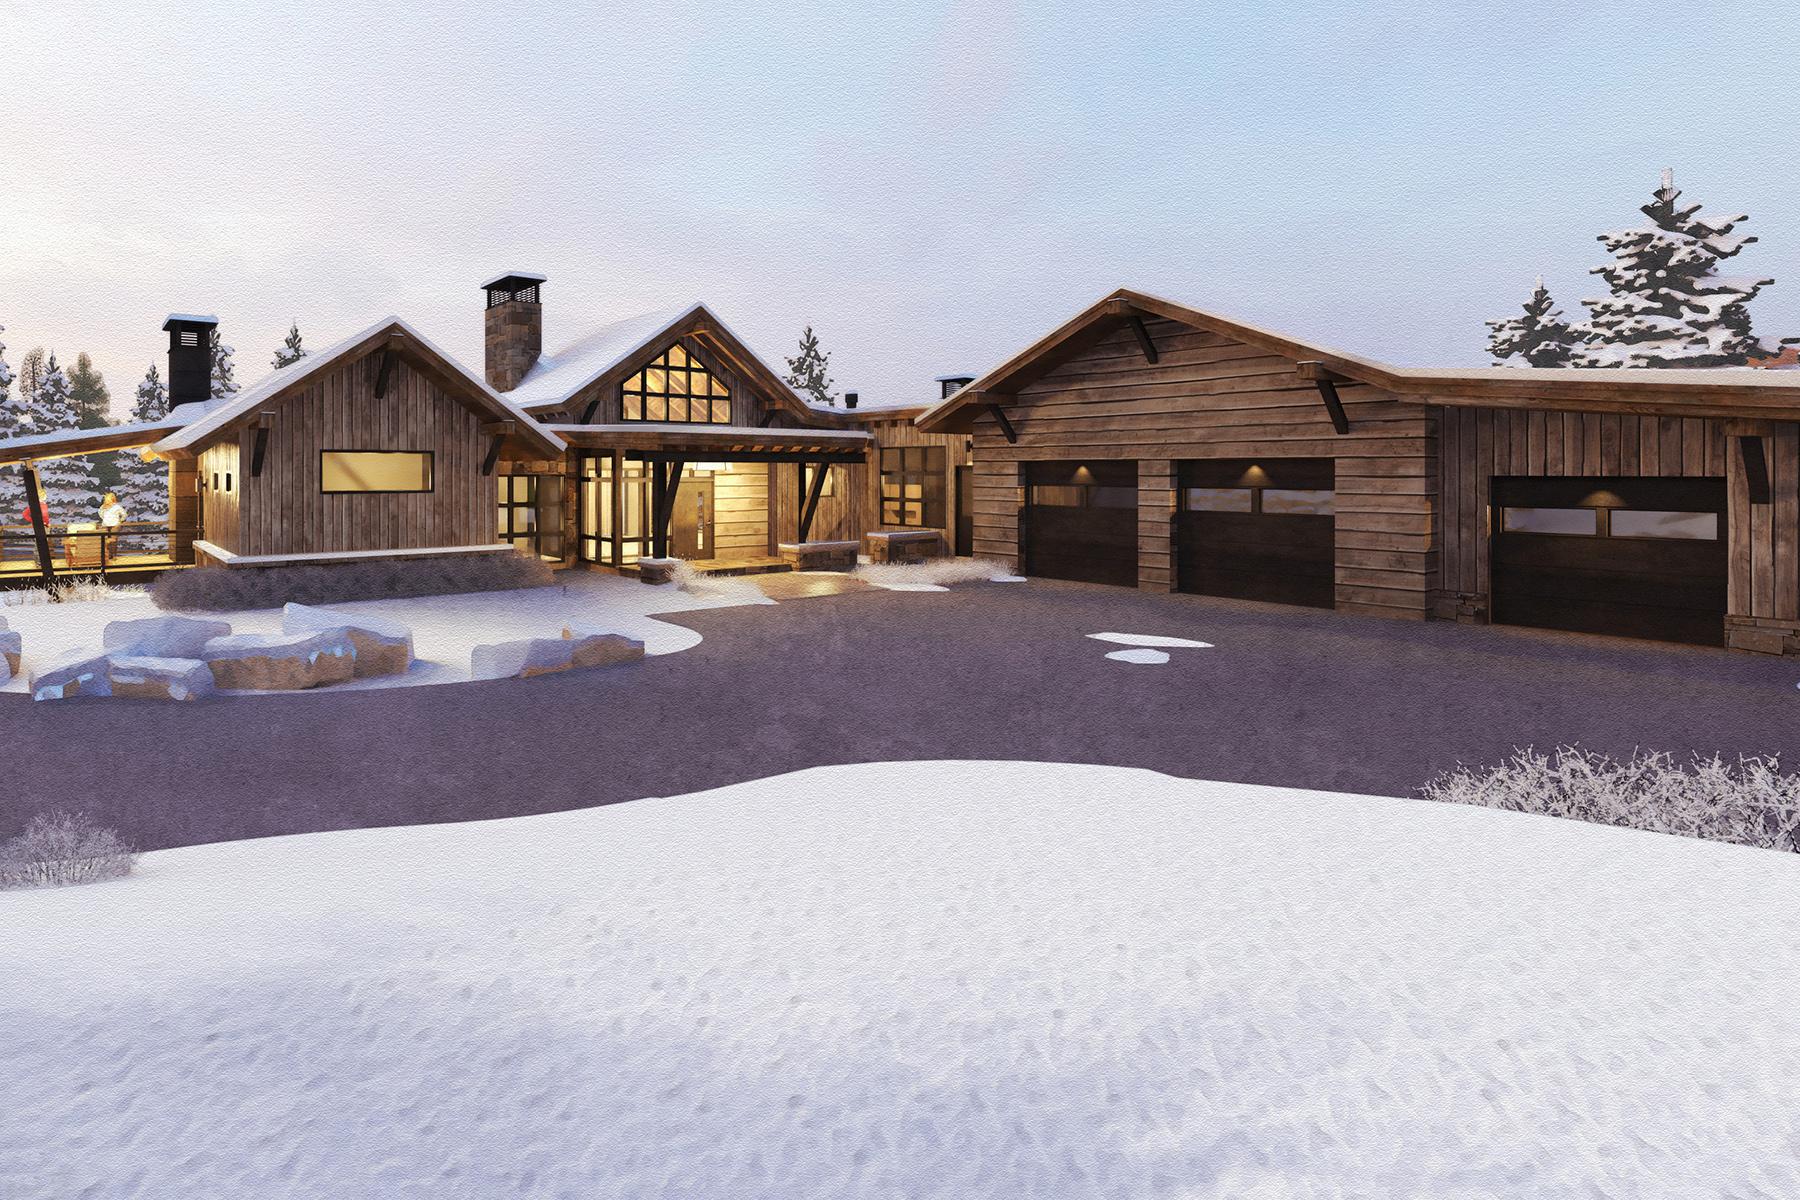 Single Family Homes for Sale at Spanish Peaks Mountain Club Elkridge Lot 57 Lot 57 Goshawk Trail Big Sky, Montana 59716 United States